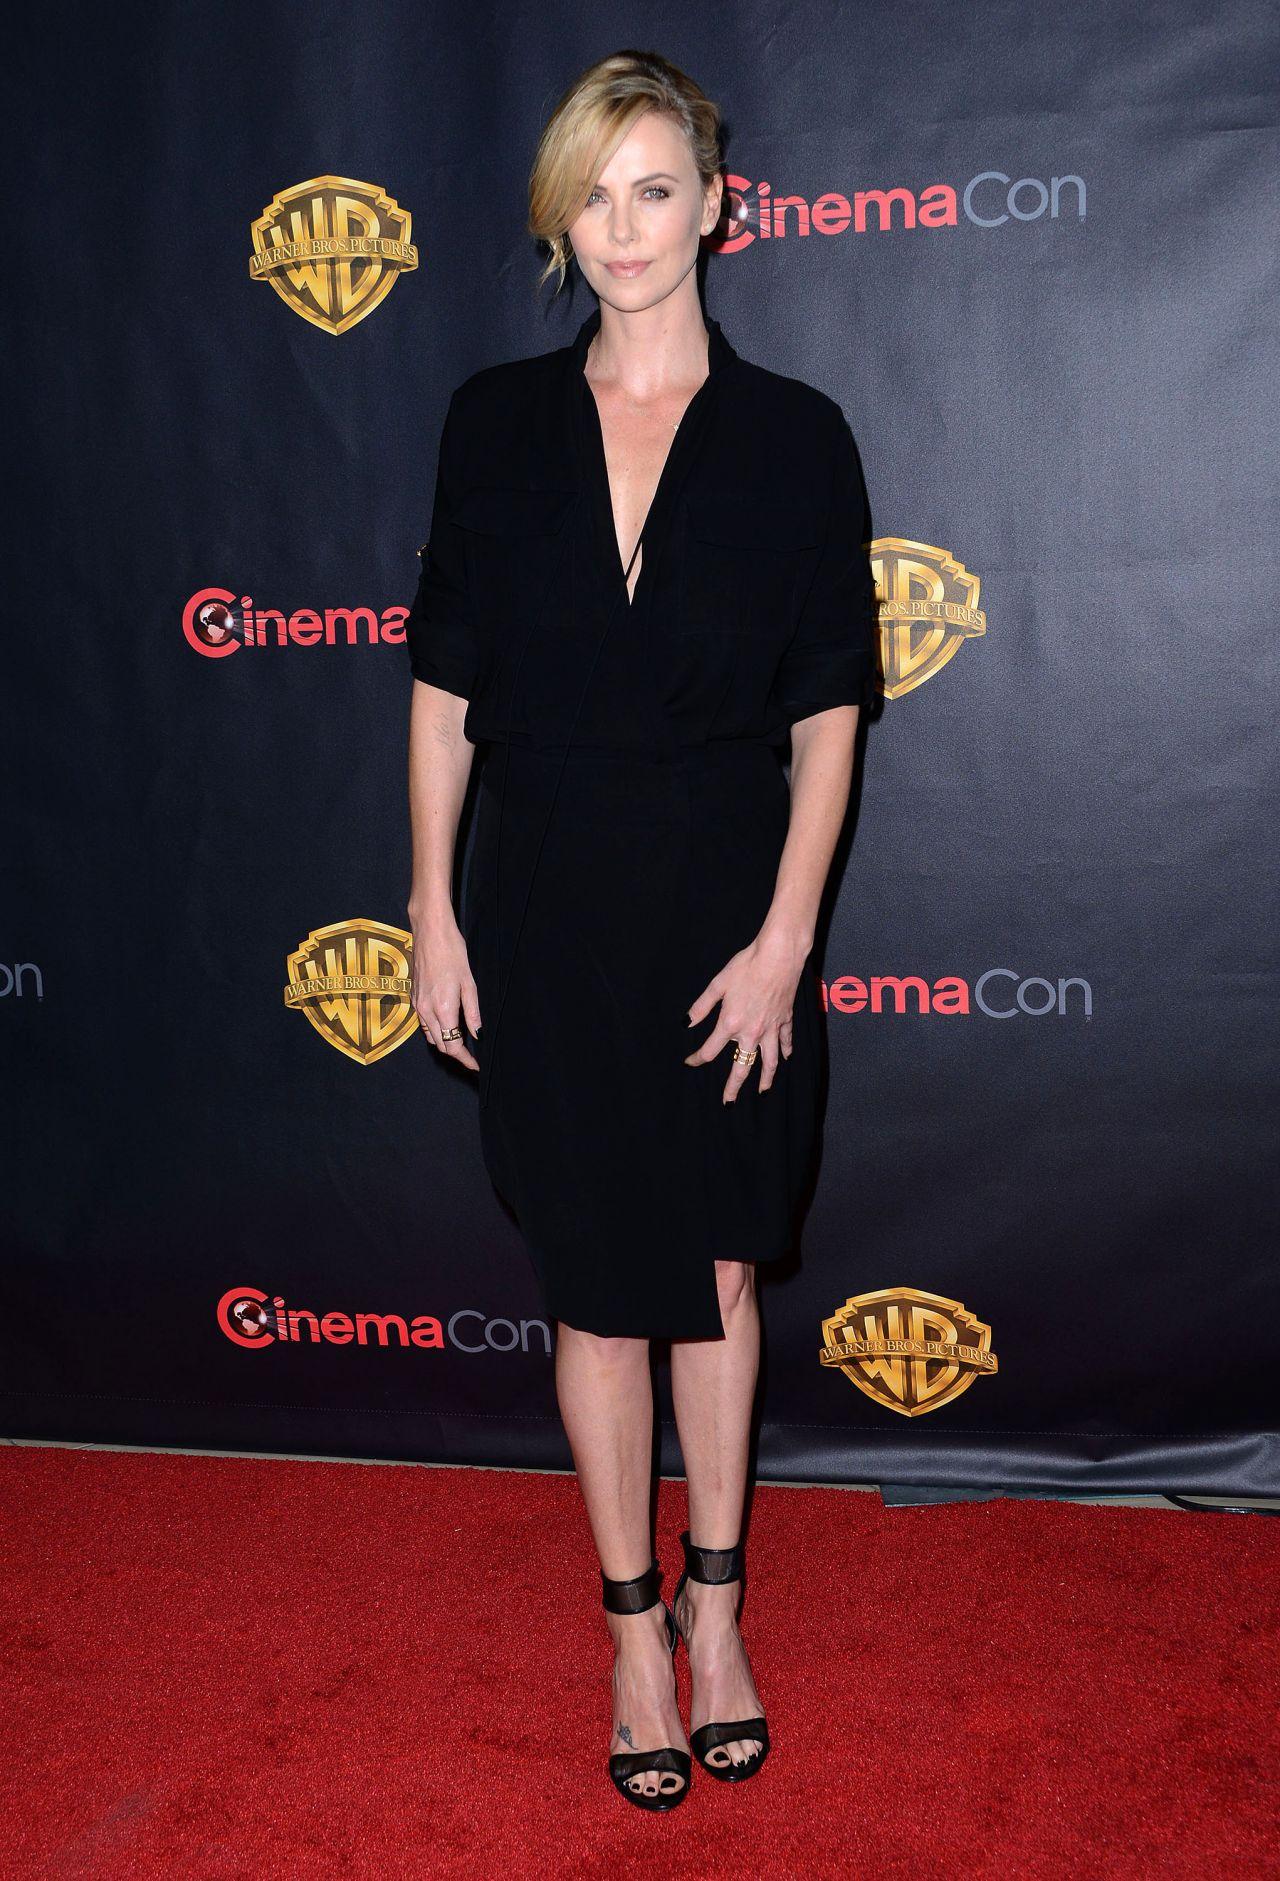 Charlize Theron - WB 2015 Cinemacon Press Line in Las Vegas